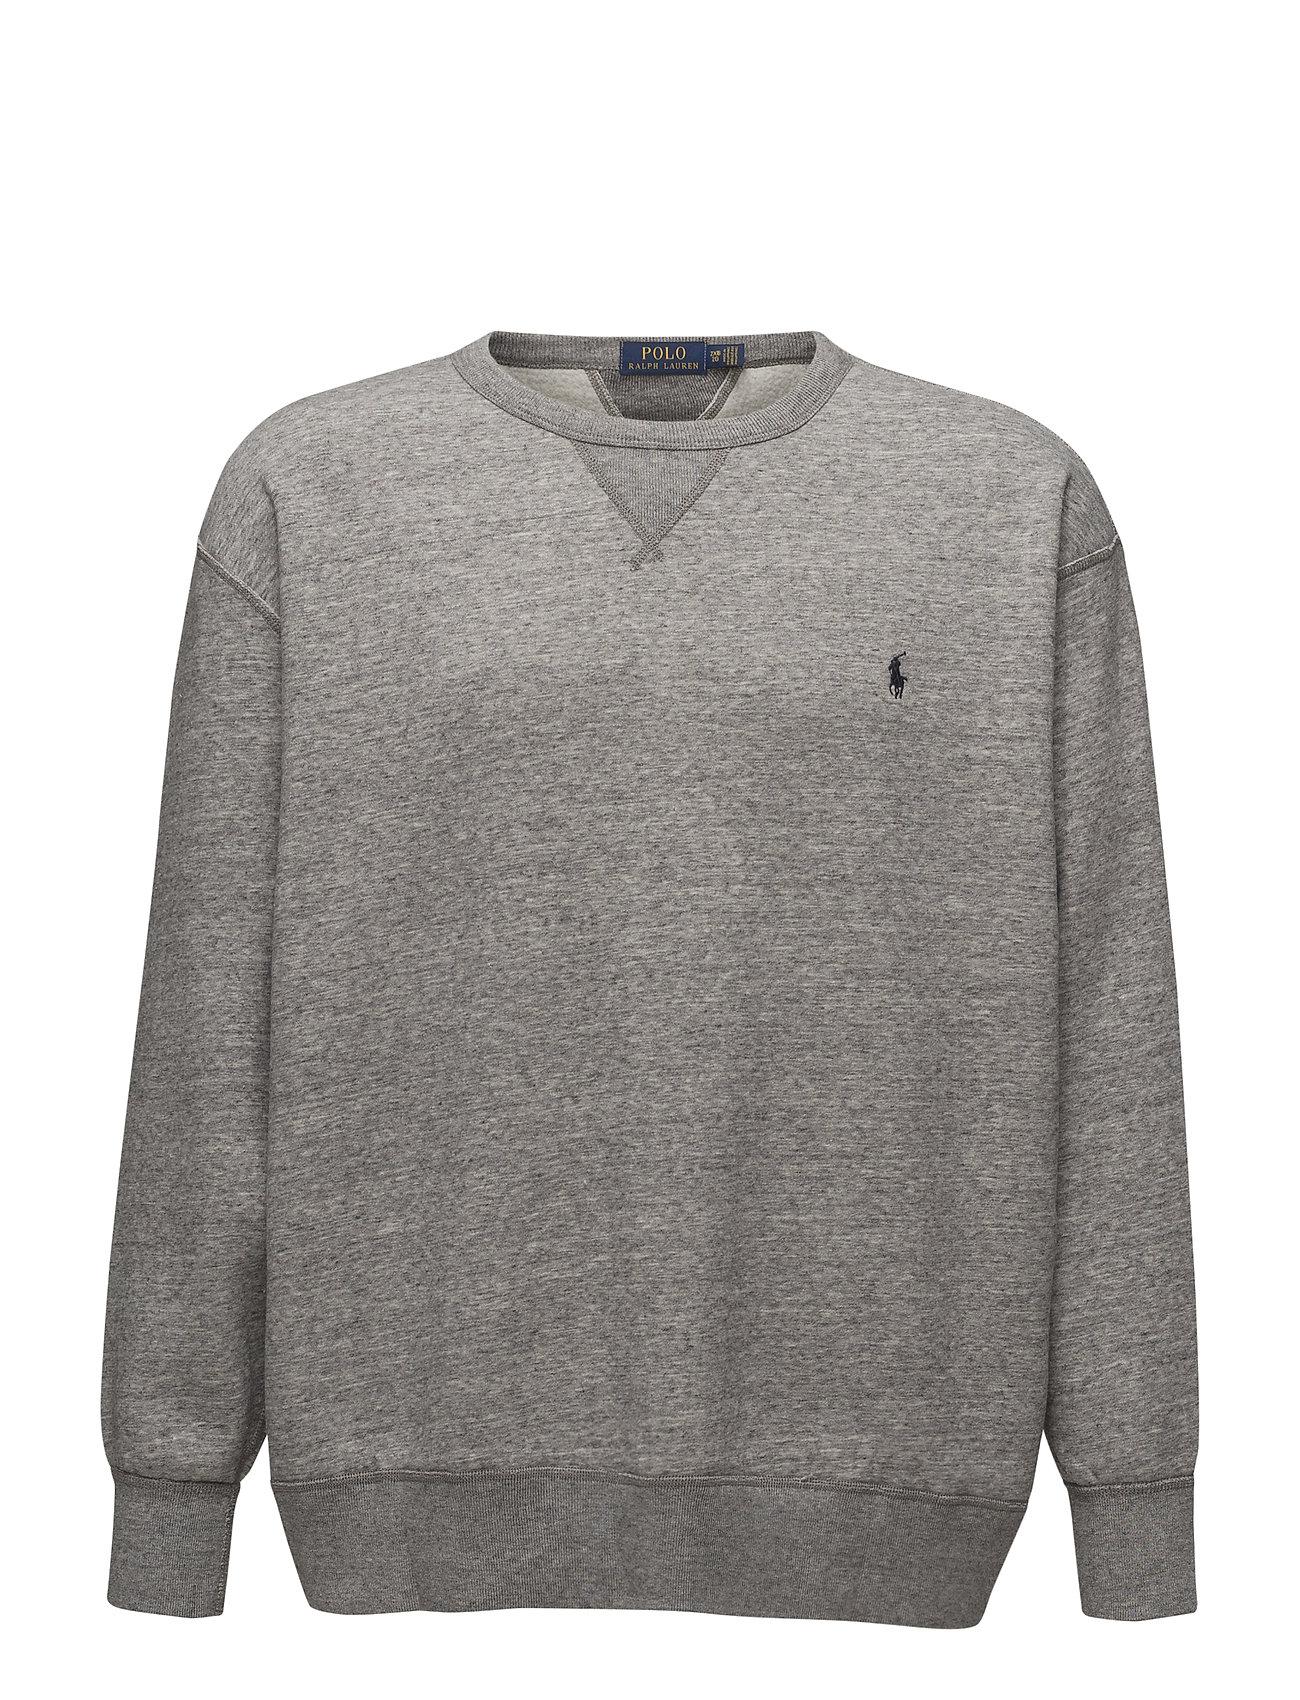 4233ae2bbaf Cotton-blend-fleece Sweatshirt (Dark Vintage Heat) (£74.25) - Polo ...